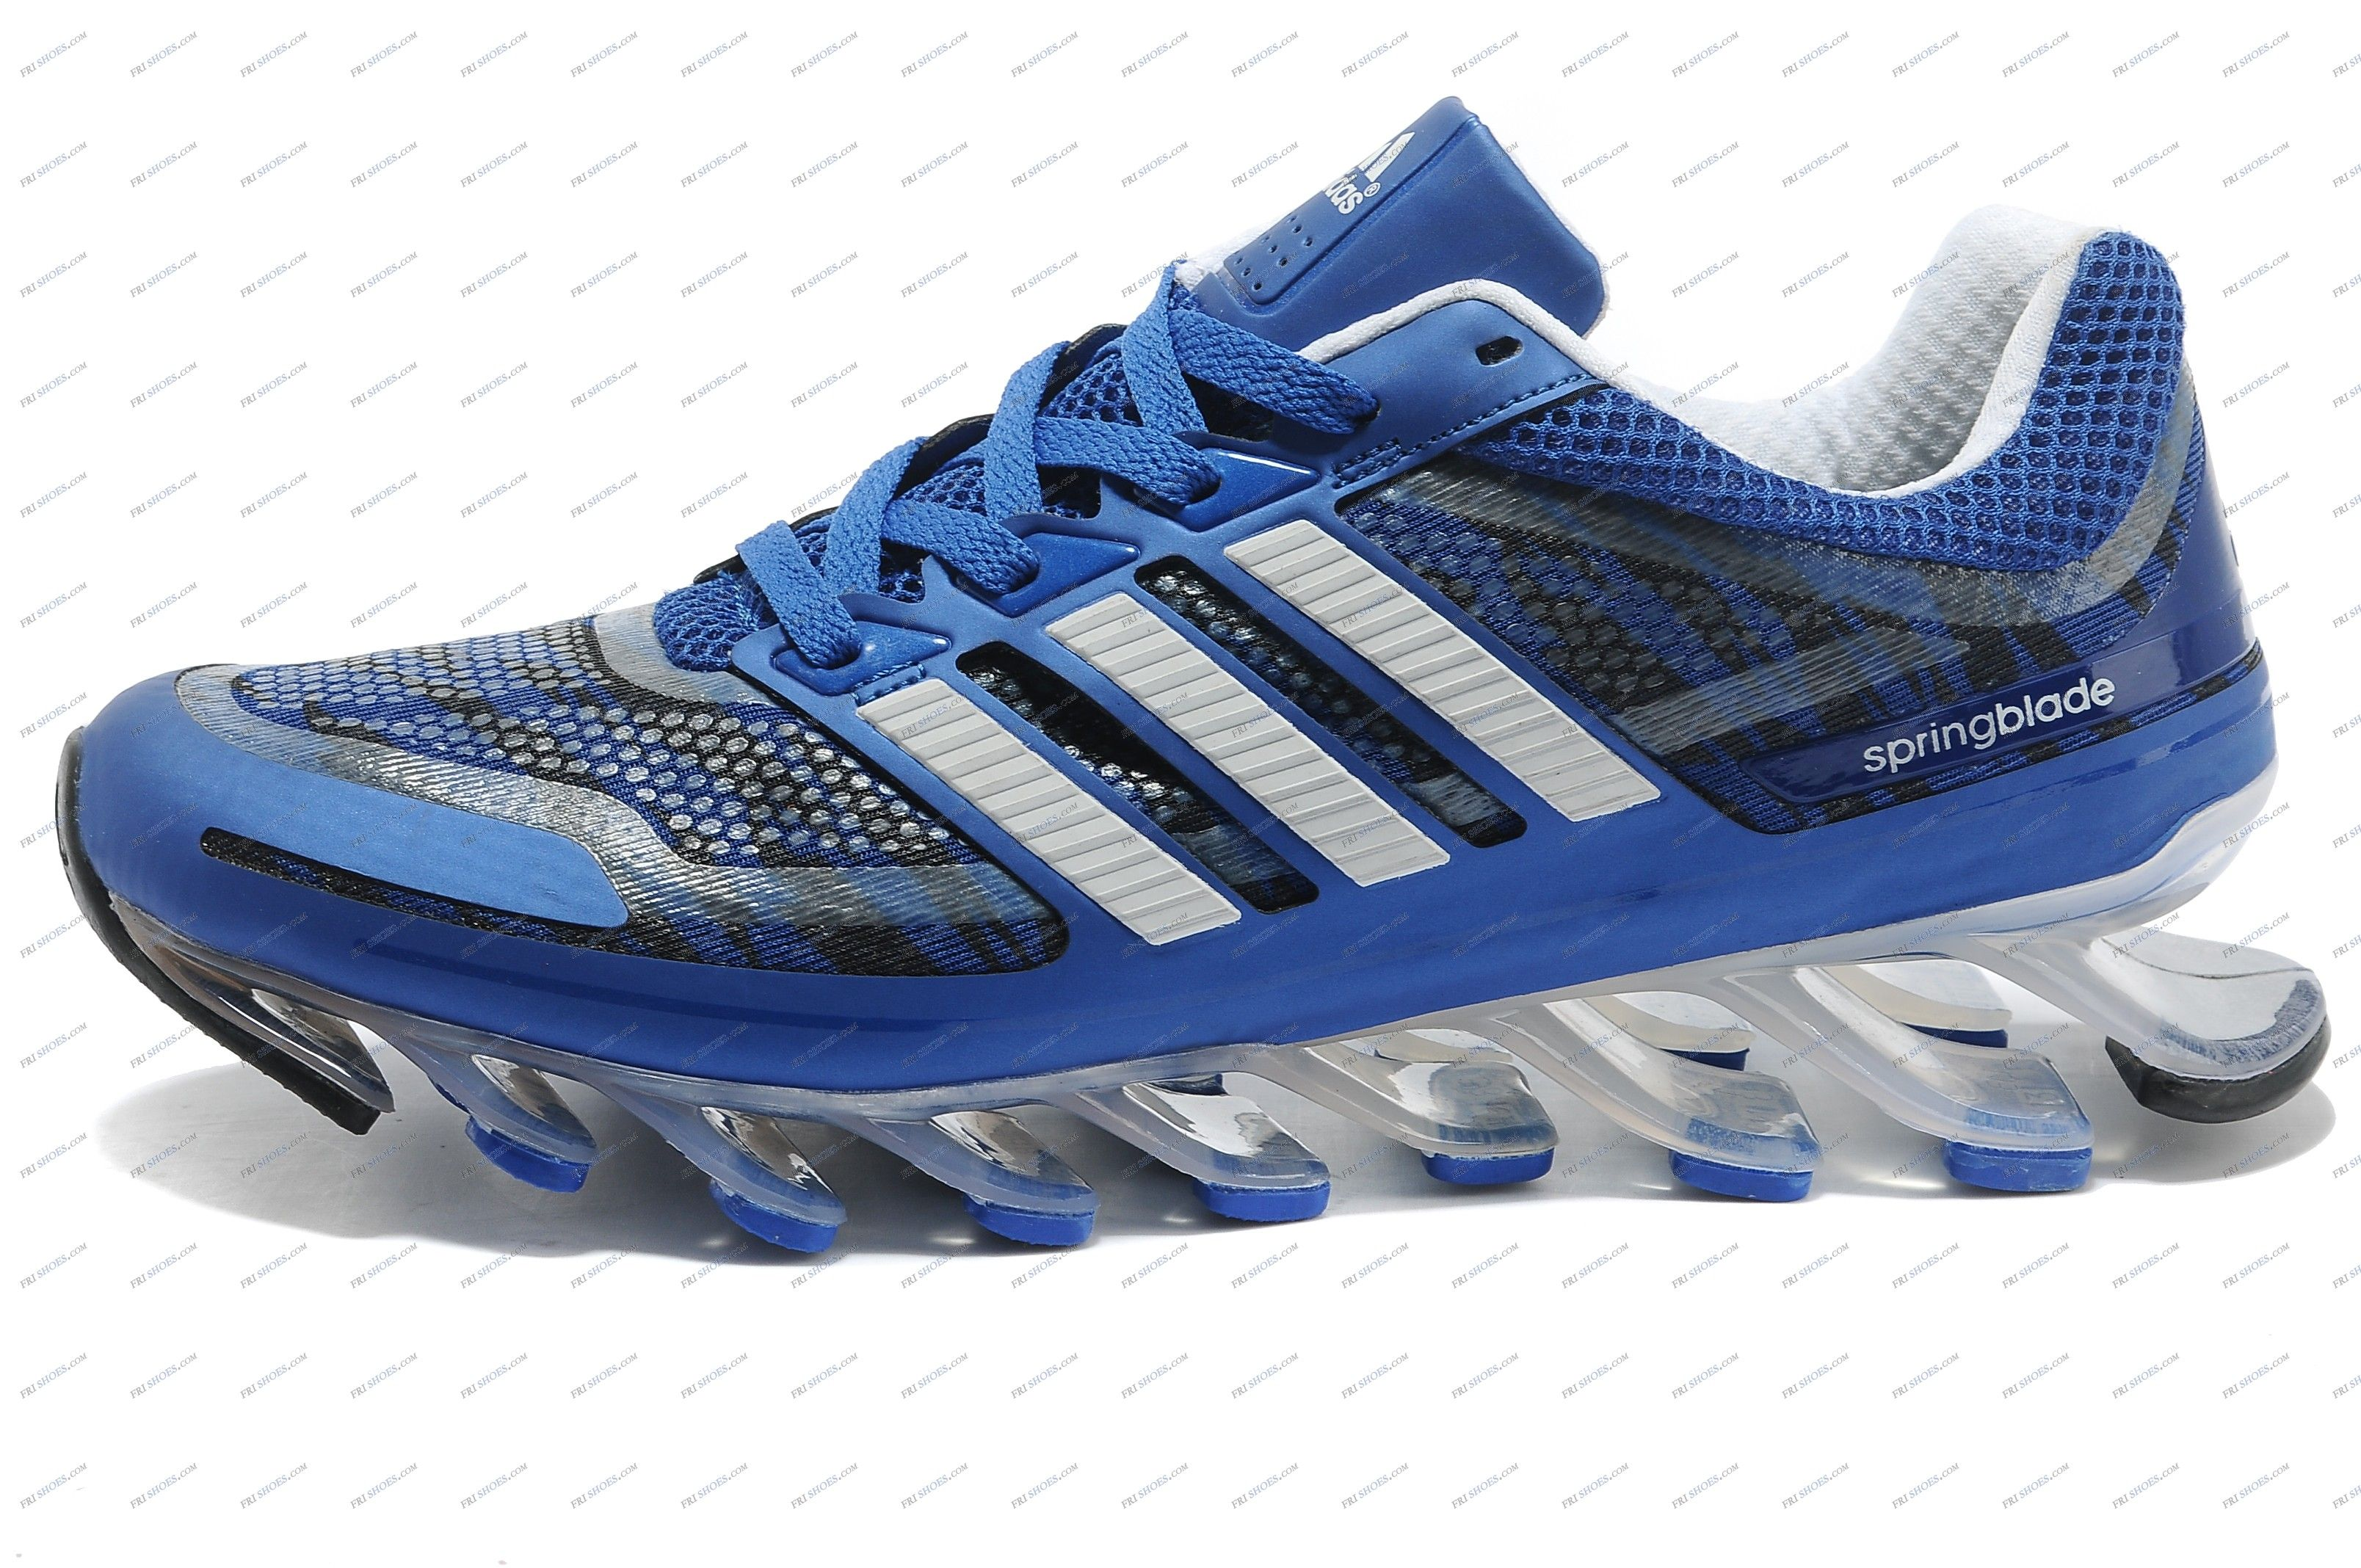 Adidas Springblade Camo Blue White Men\u0027s Running shoes outlet adidas